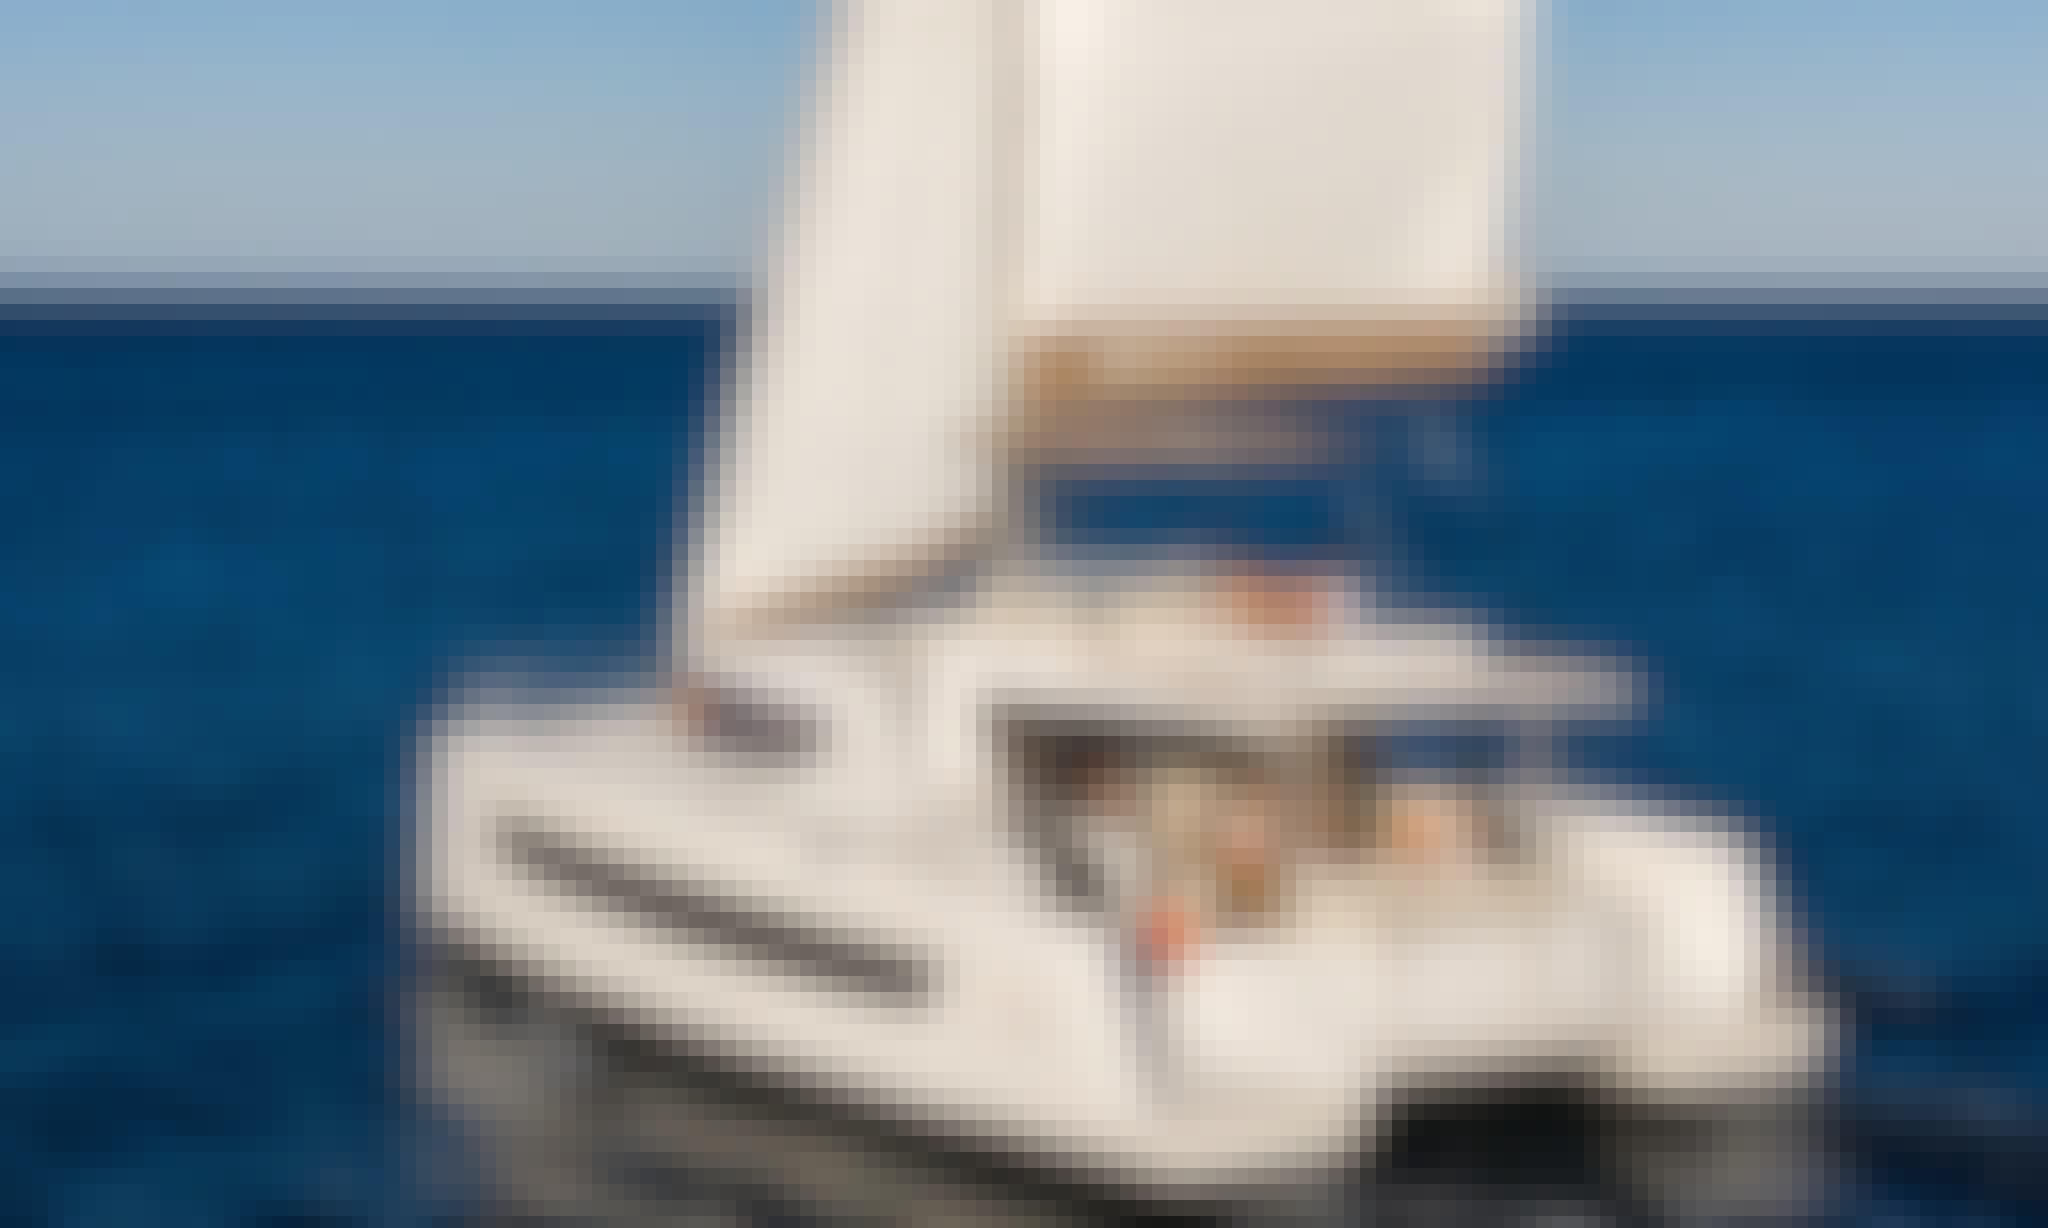 Bali 4.8 Cruising Catamaran Bareboat Charter for 12 People in Alimos, Greece